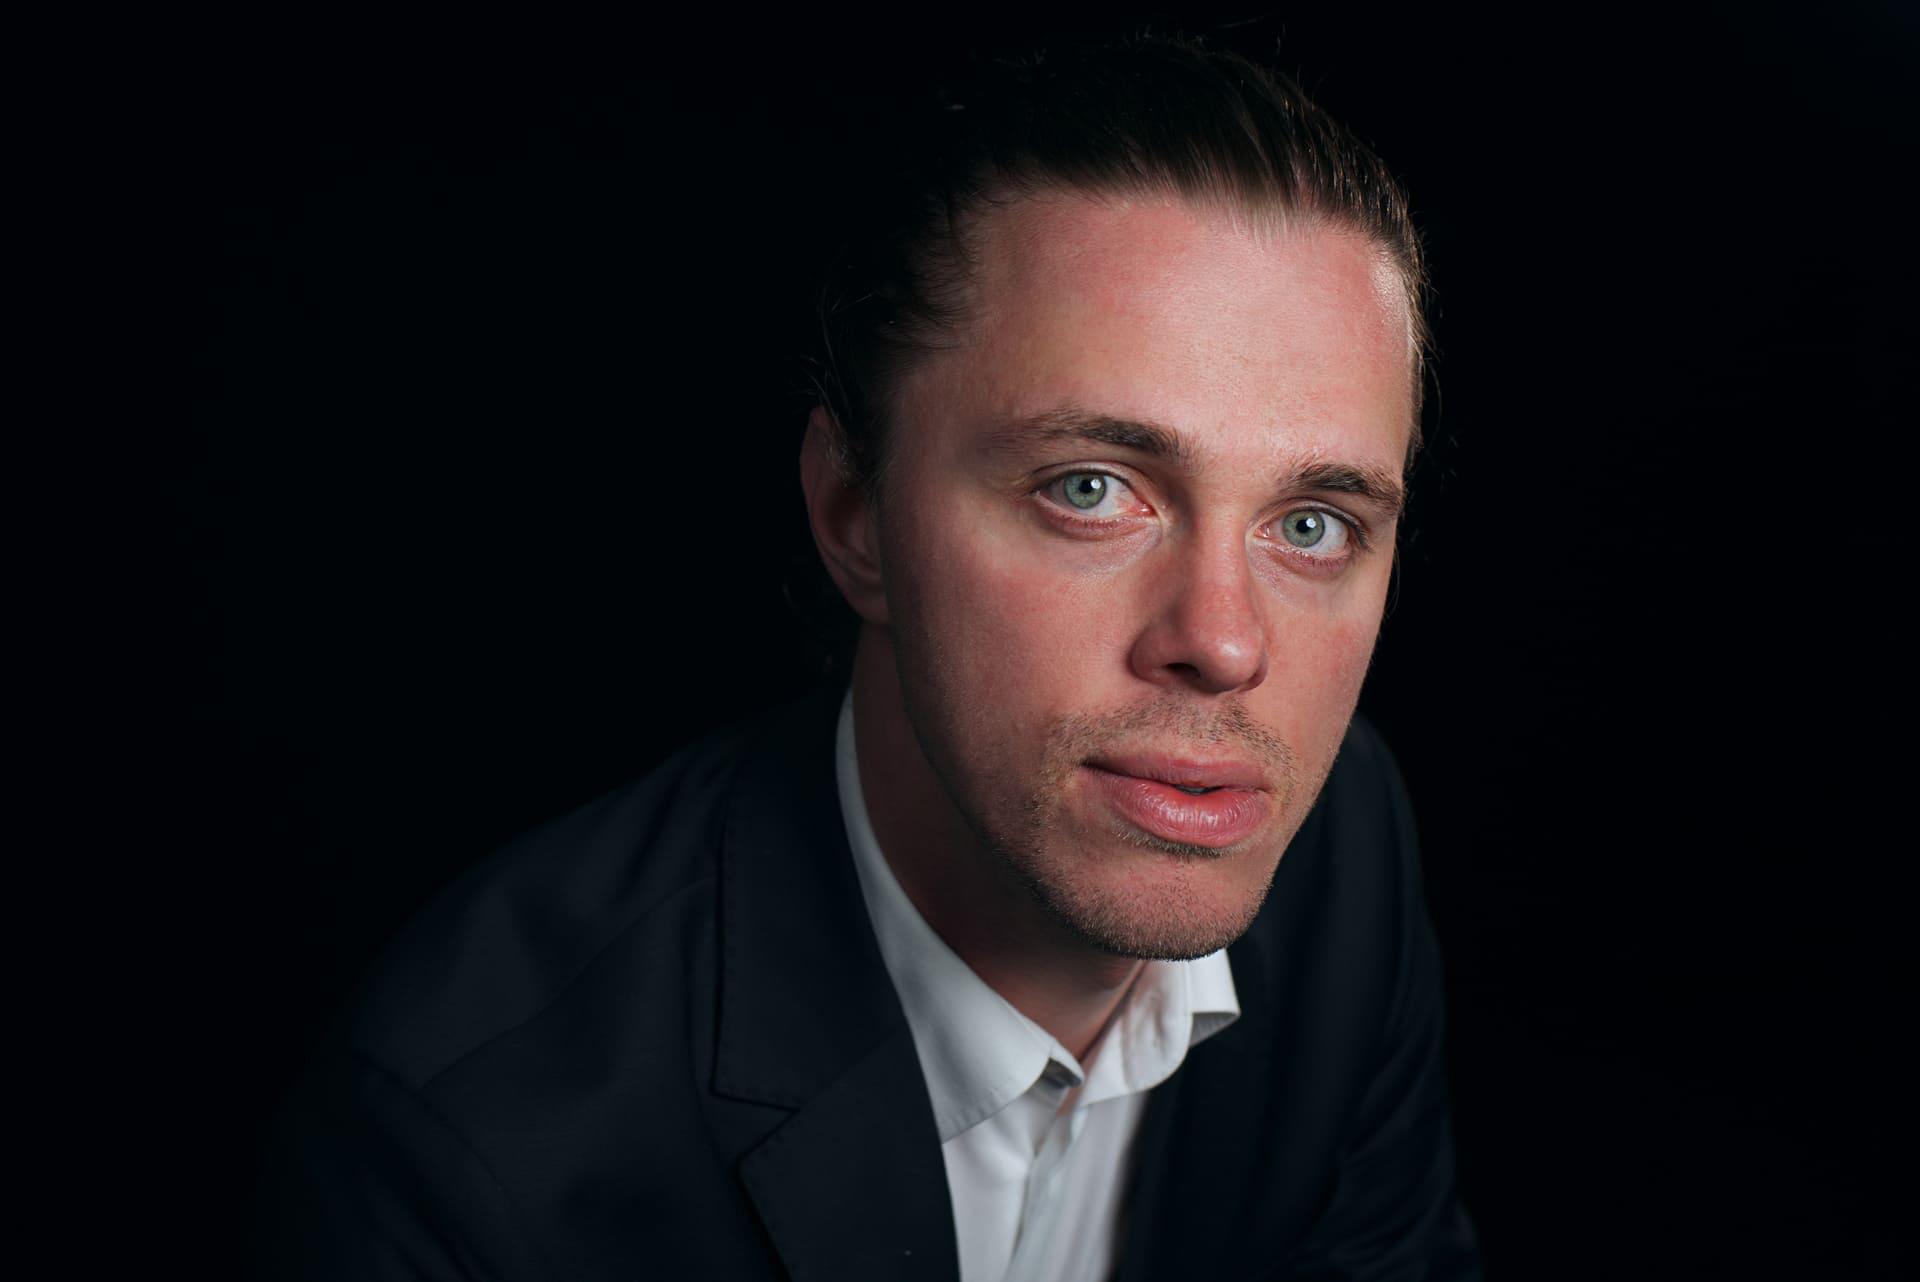 David Risberg 4 - photo by Helgi Reynisson